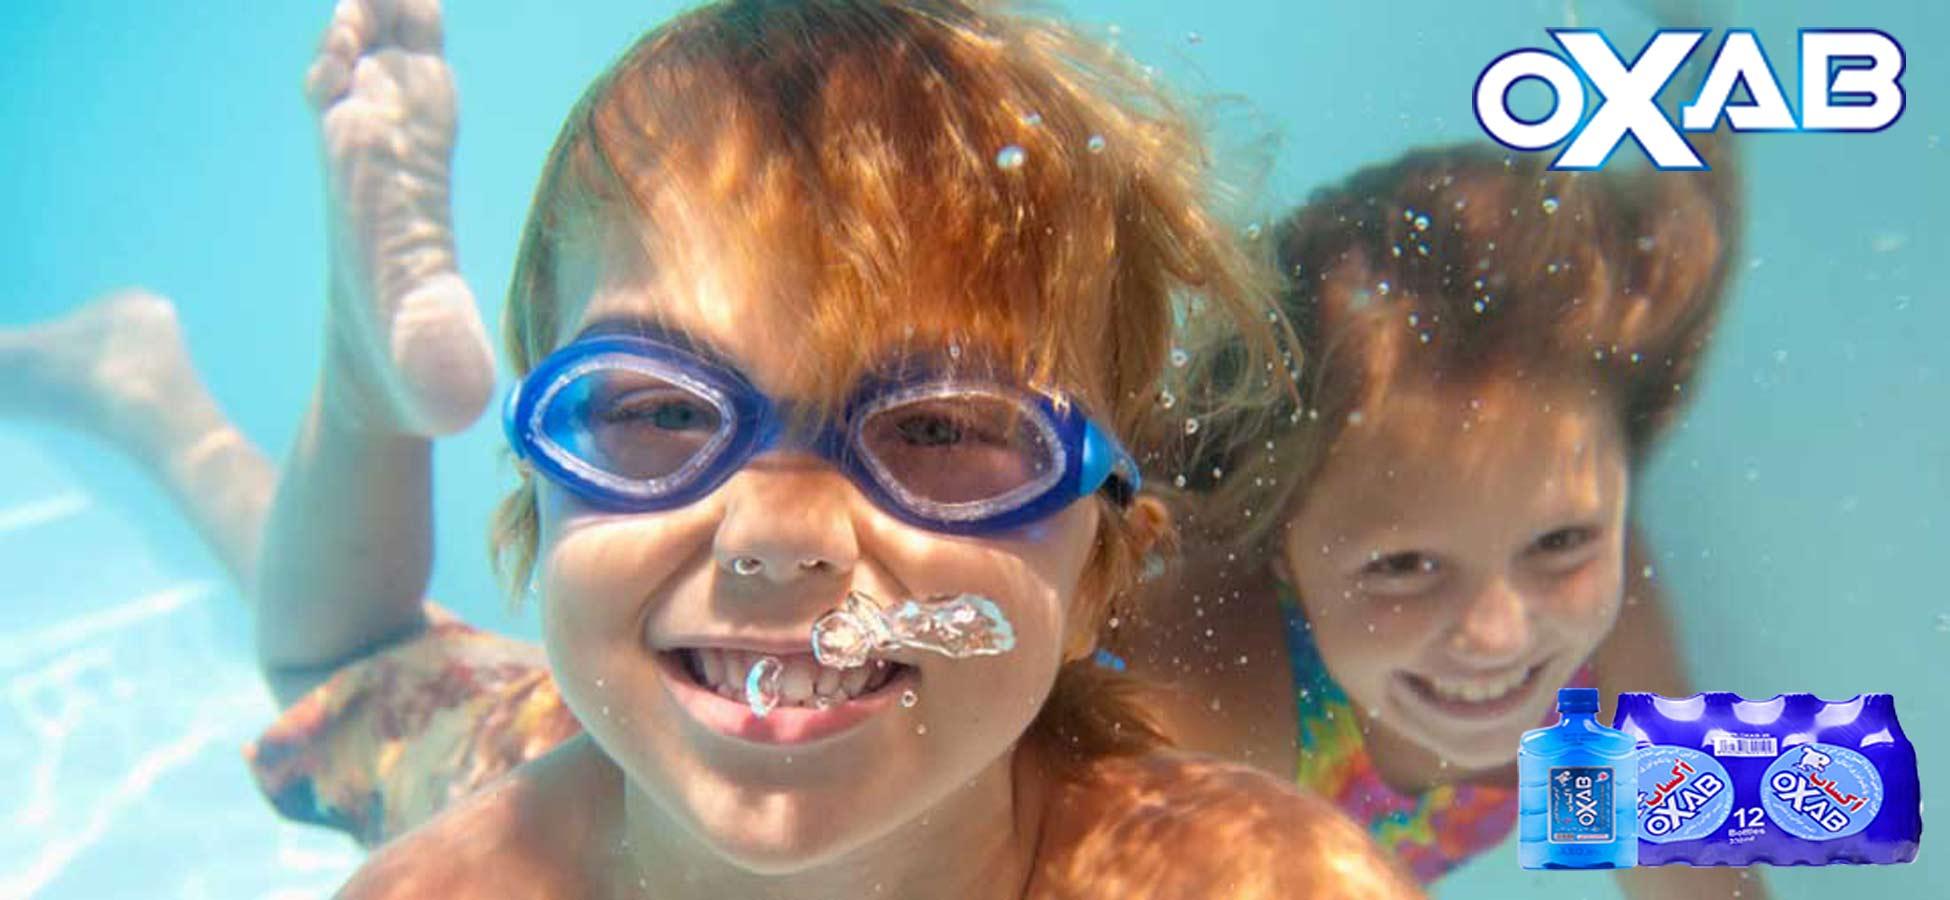 کلر آب چه تاثیری بر سلامت دندان ها دارد؟